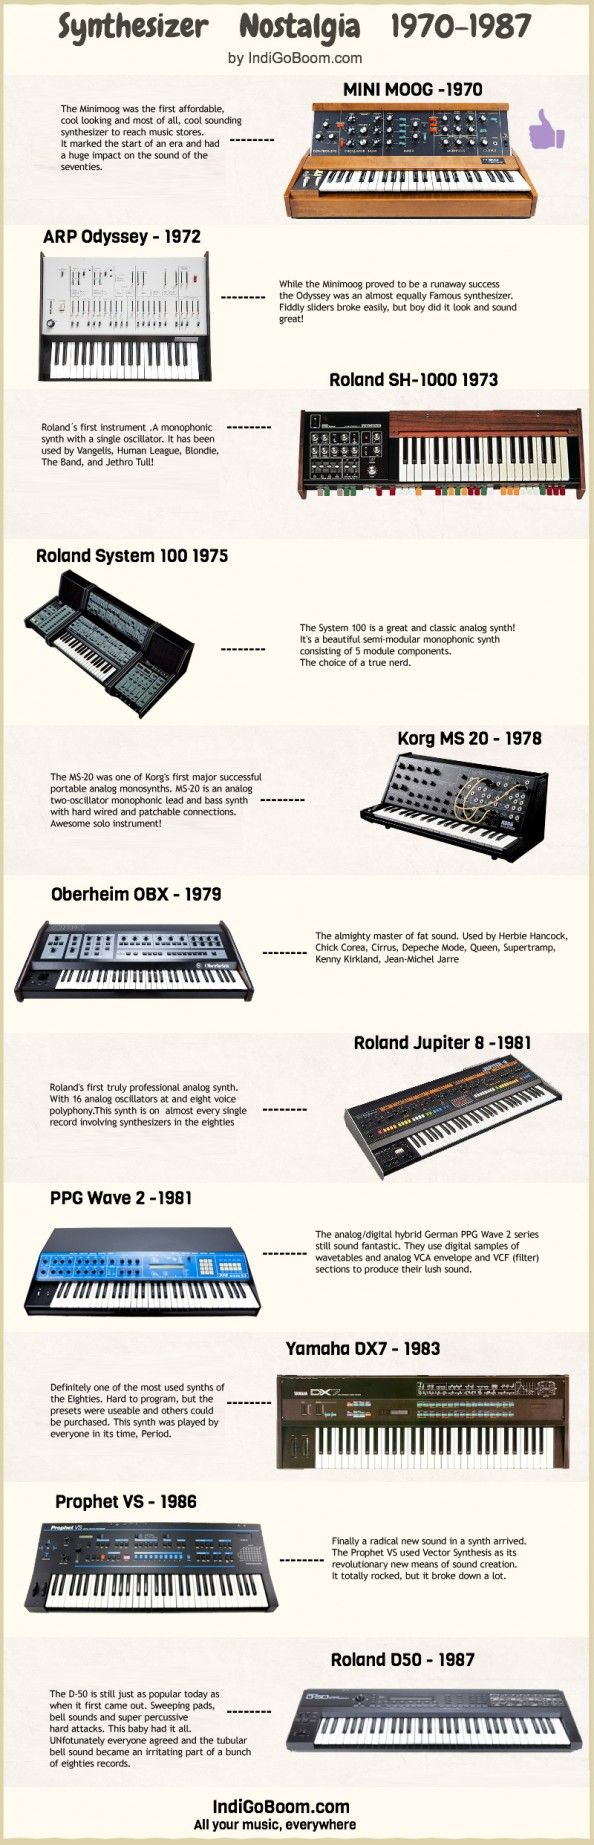 Synthesizer Nostalgia Infographic